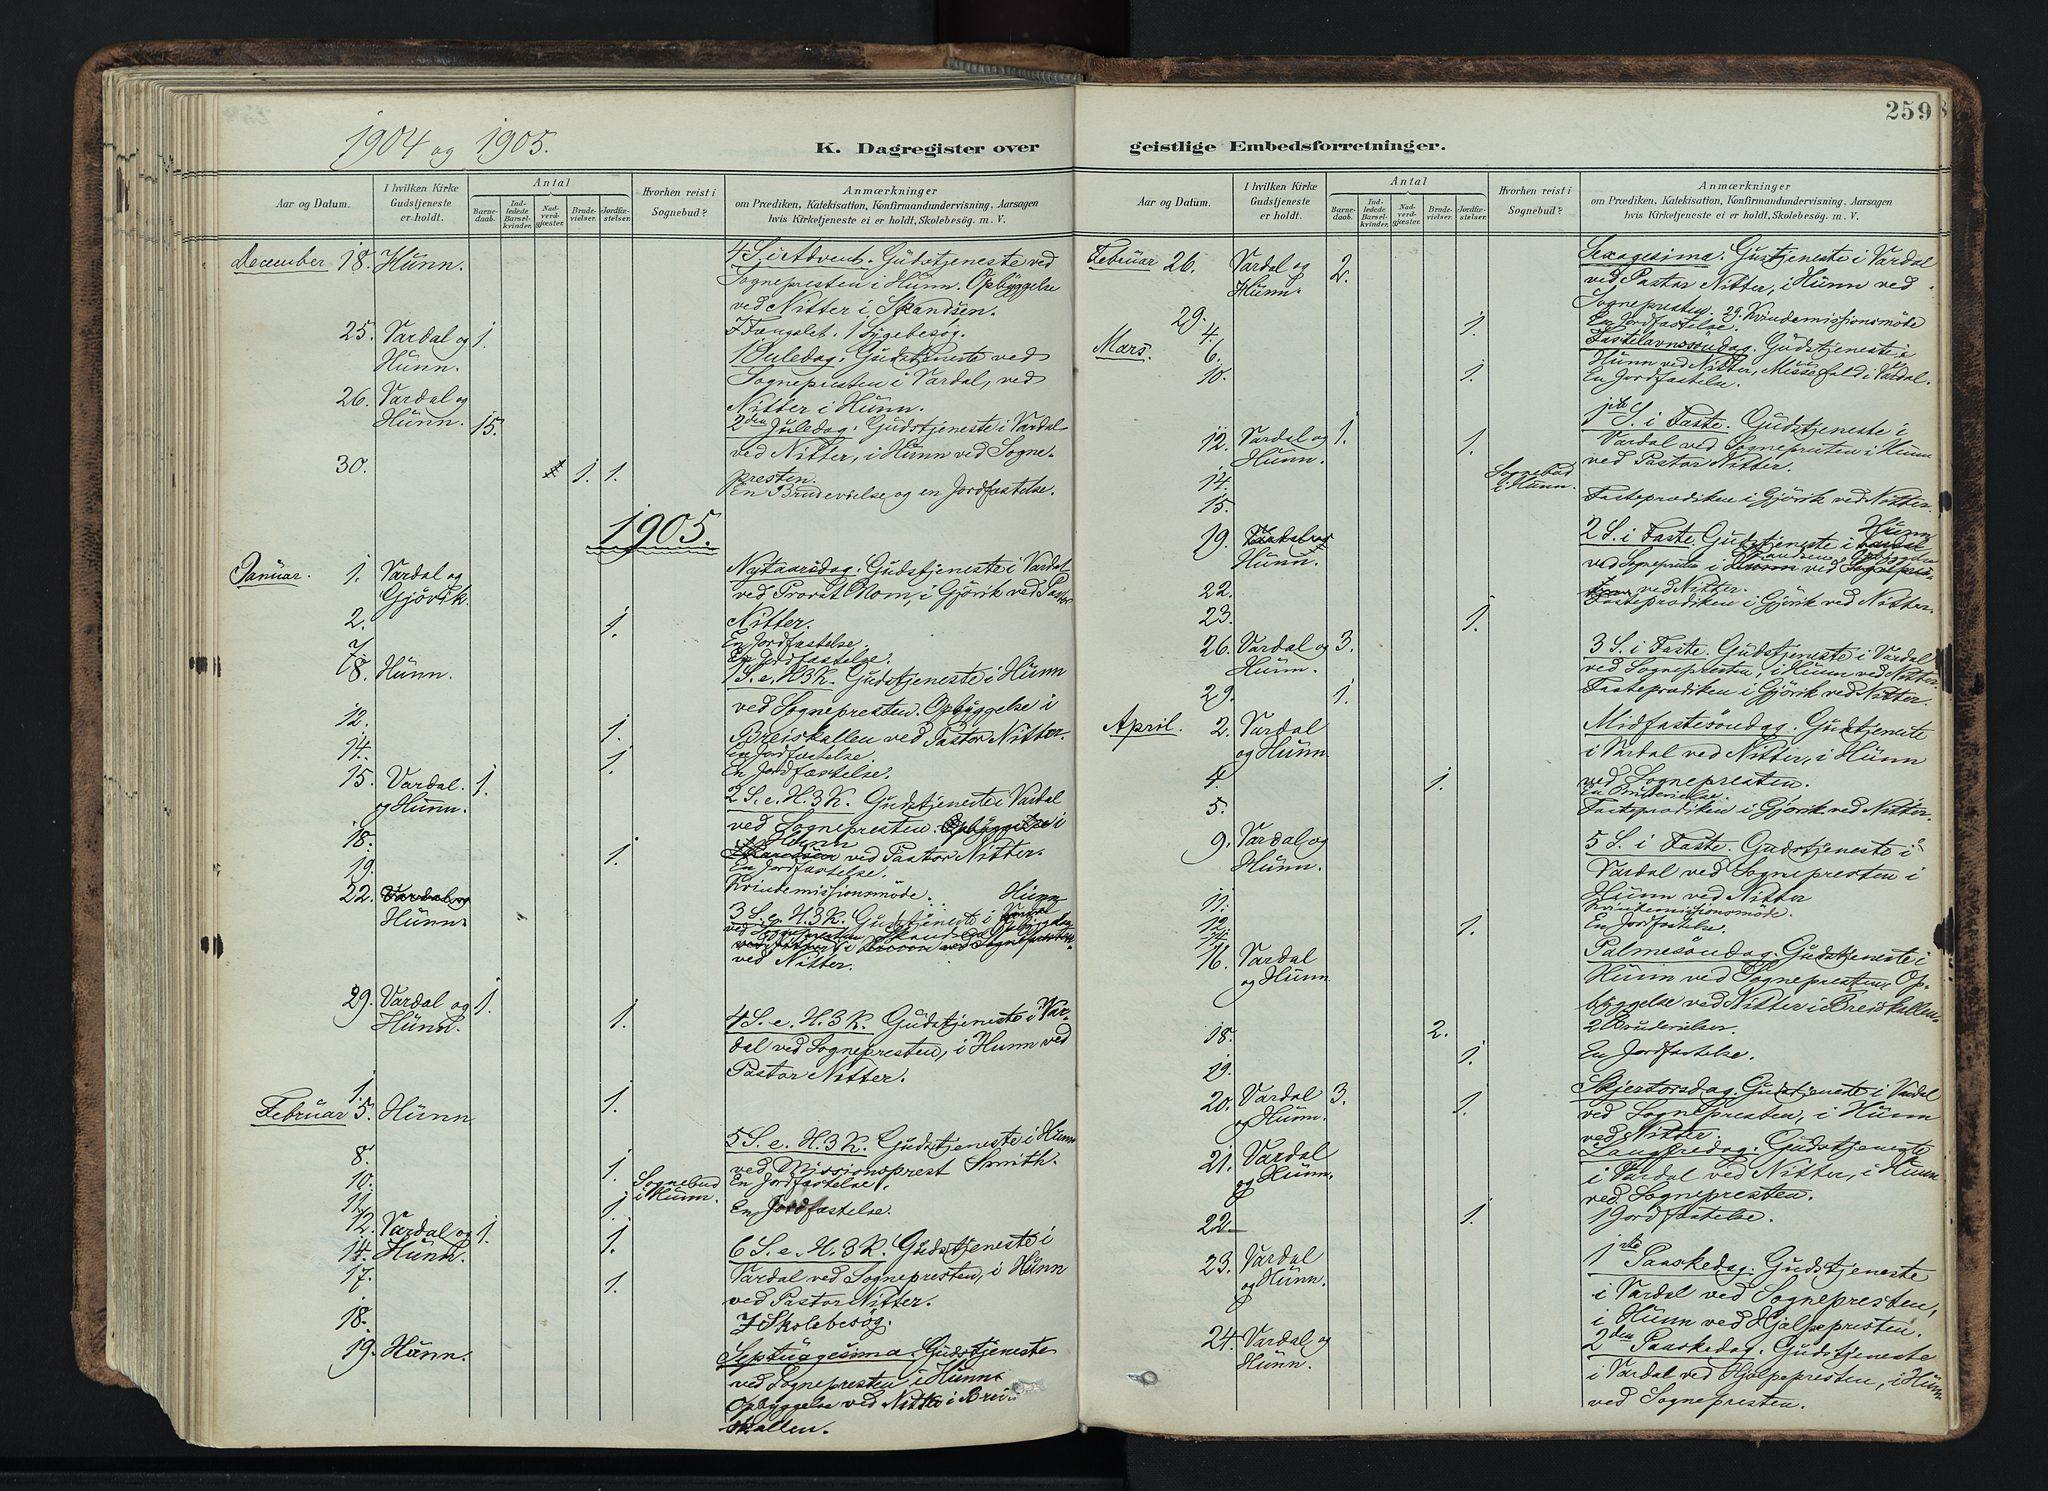 SAH, Vardal prestekontor, H/Ha/Haa/L0019: Ministerialbok nr. 19, 1893-1907, s. 259